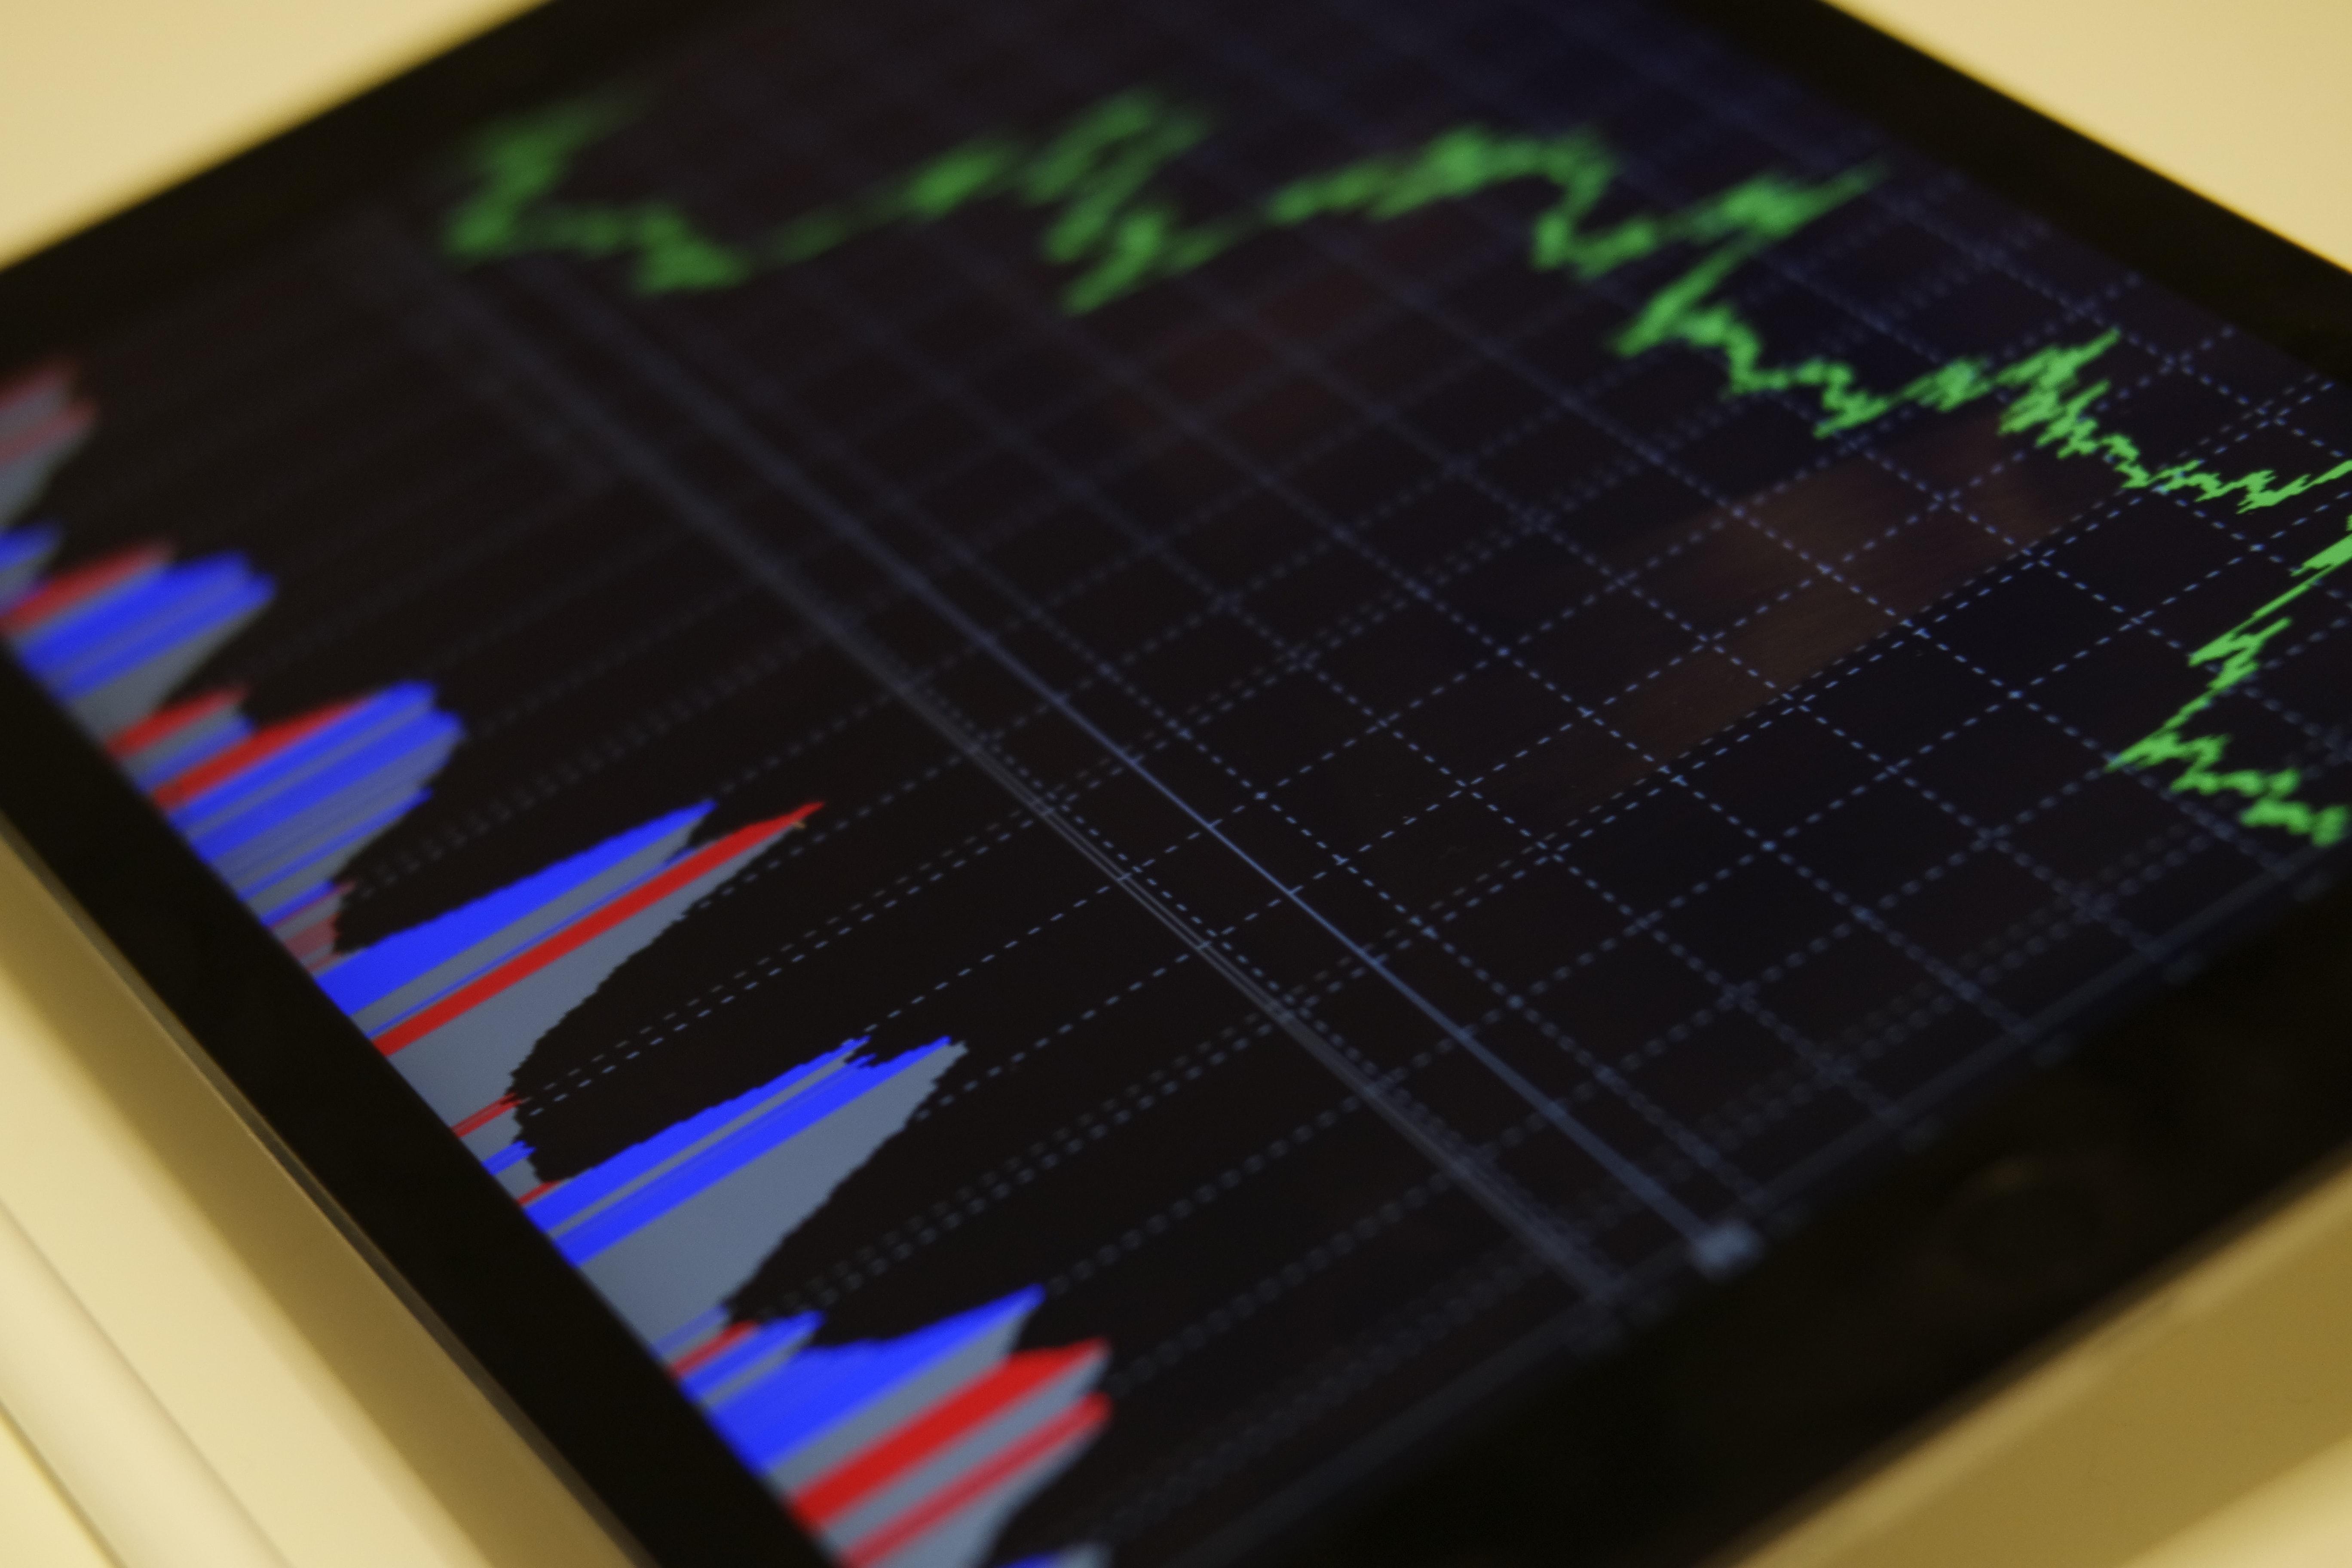 Devo investir no mercado Forex durante a crise de COVID 19?